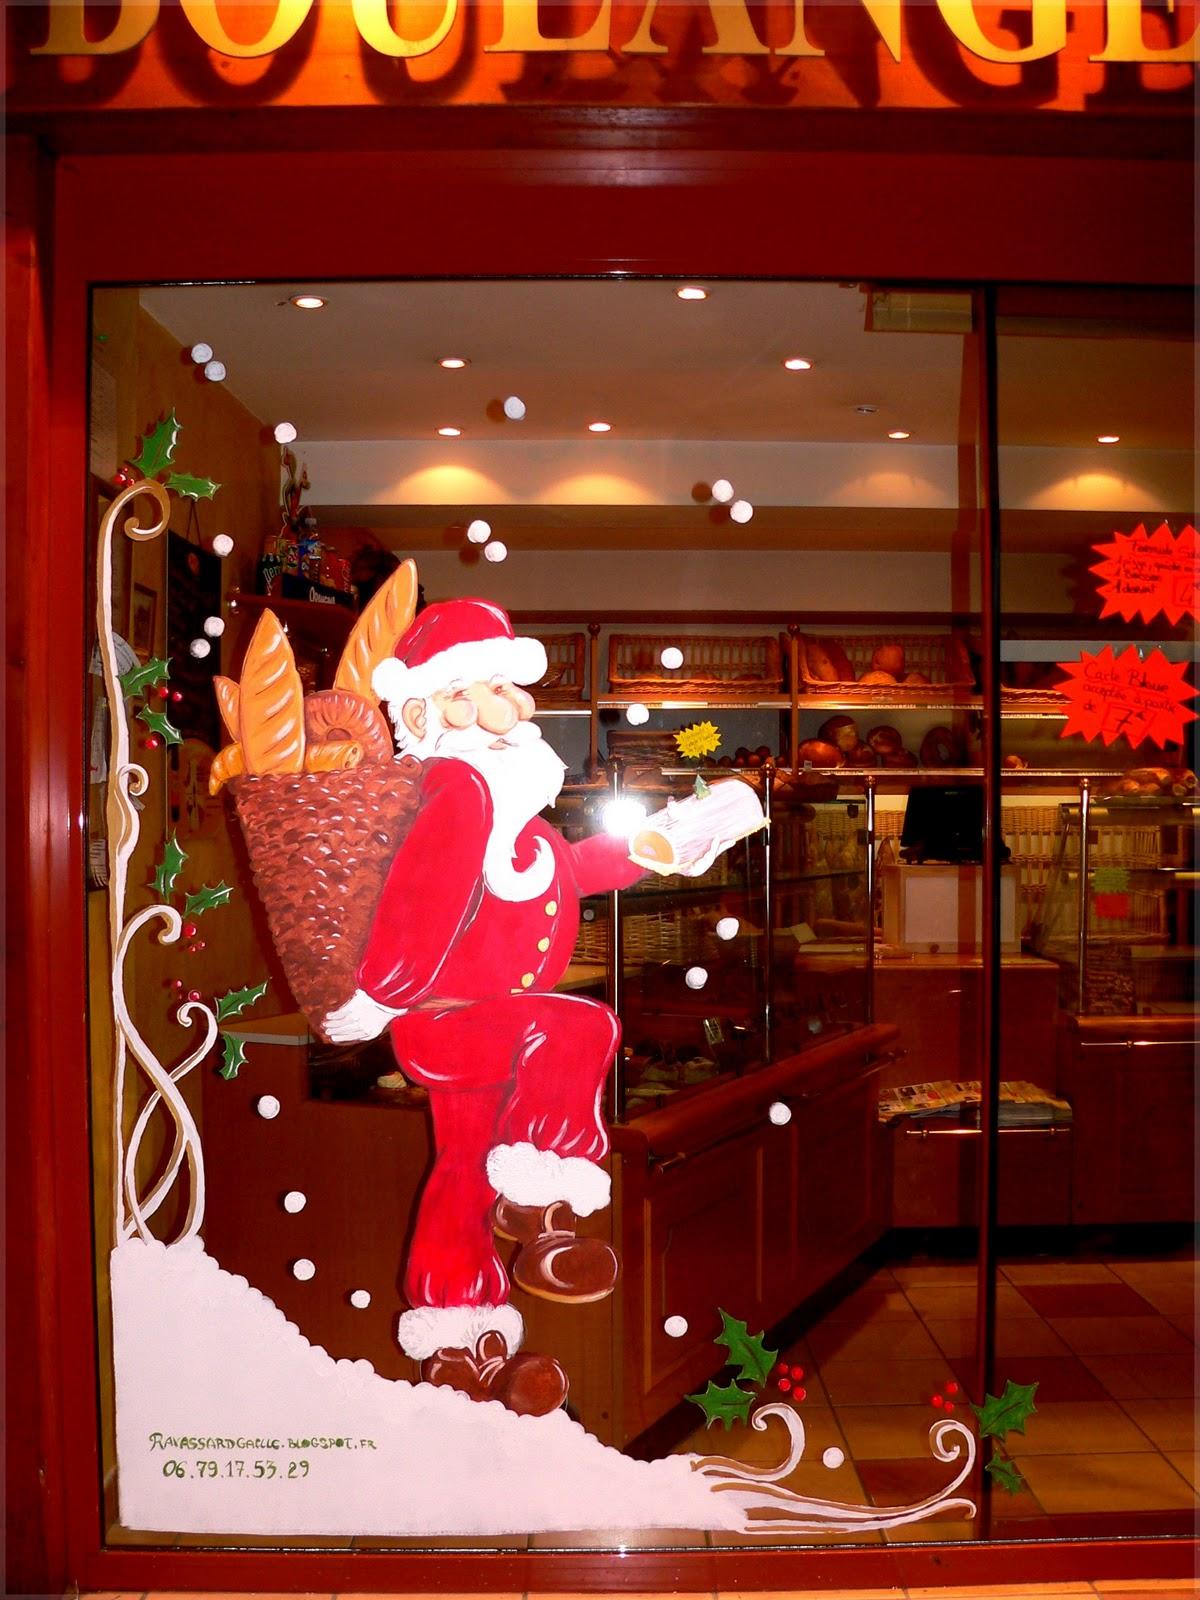 Ravassard ga lle cr ation vitrine de no l boulangerie - Decoration de noel vitrine ...